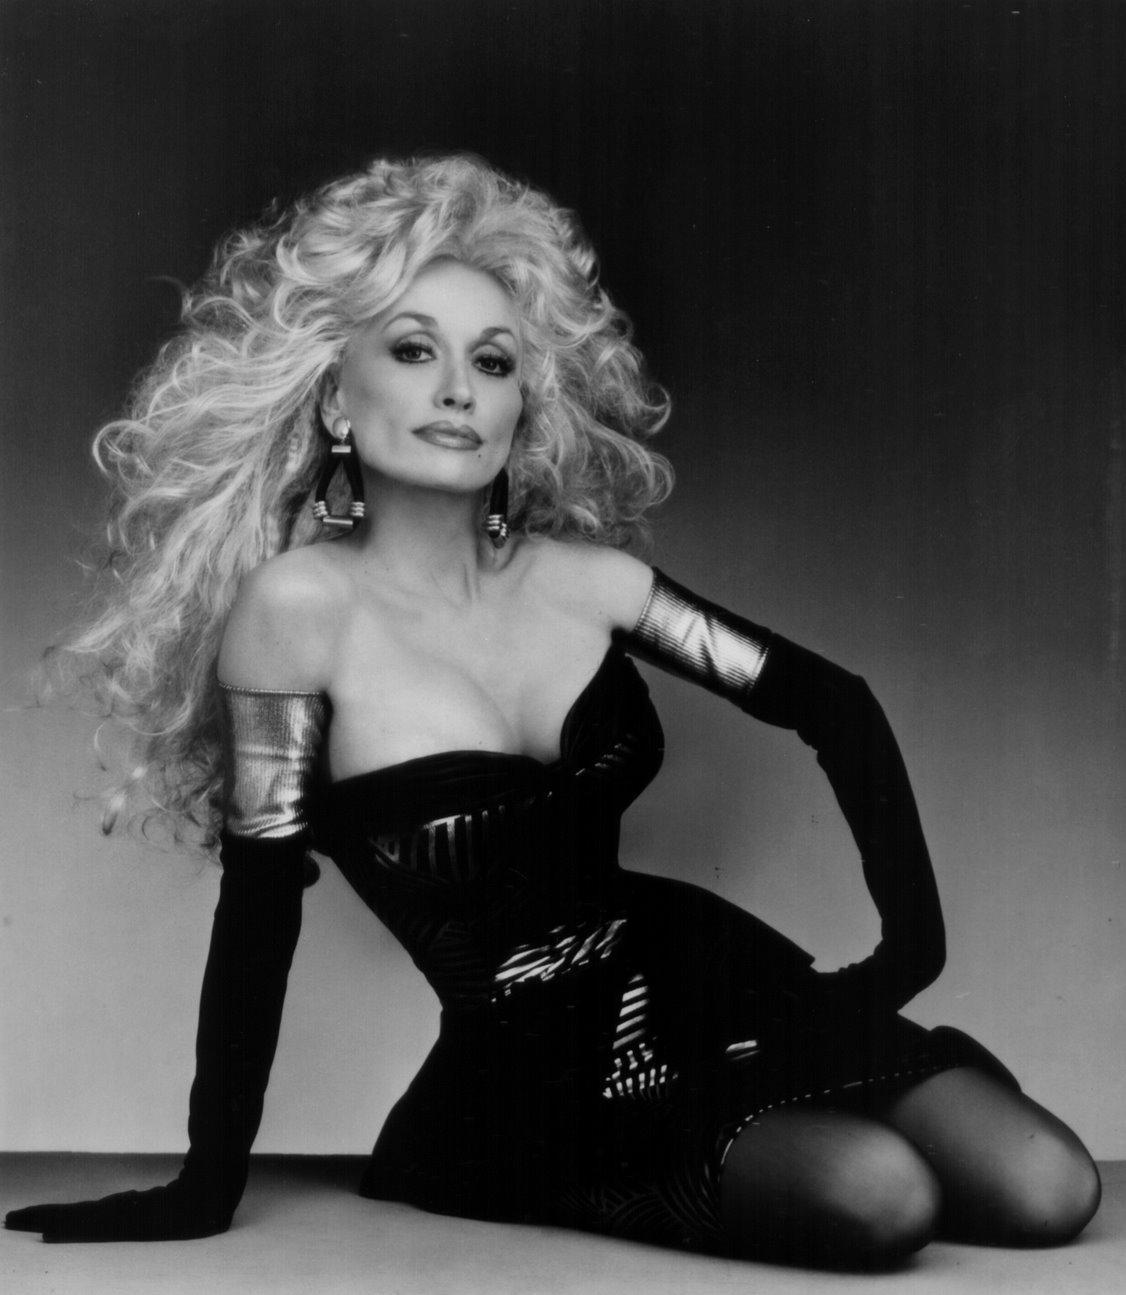 Dolly+Parton+DollyPartonRainbowPhoto.jpg